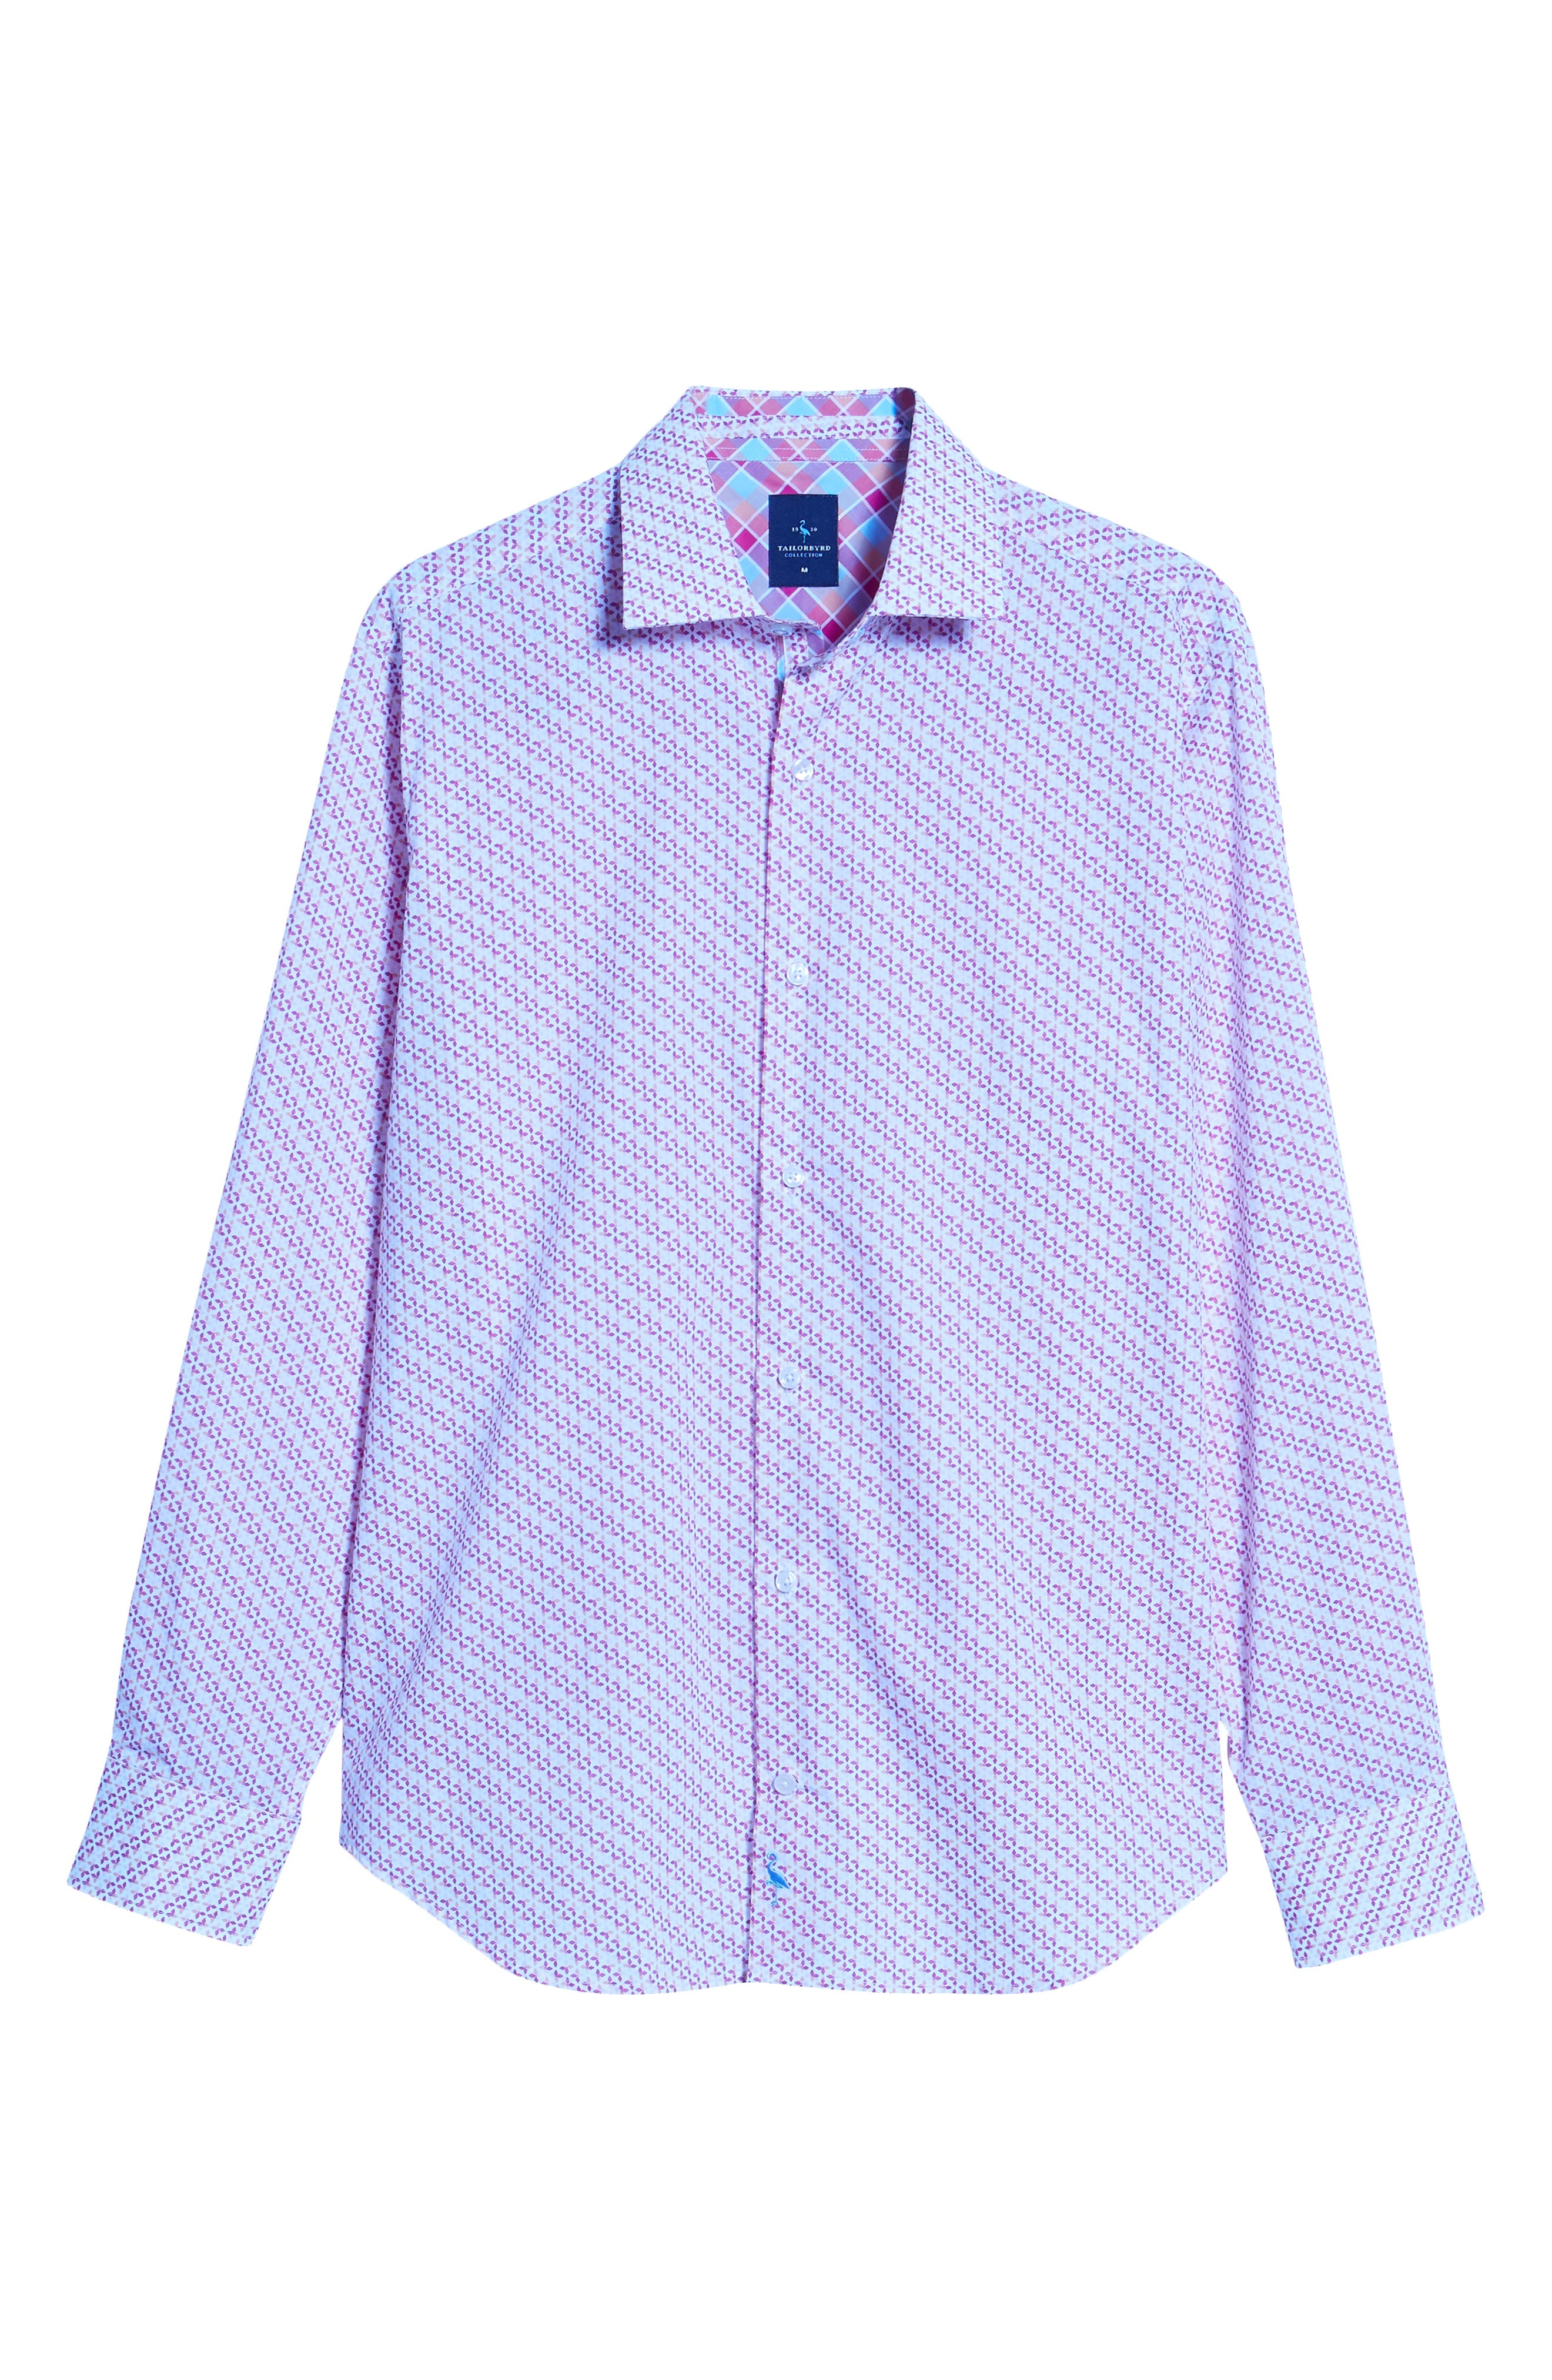 Ade Regular Fit Print Sport Shirt,                             Alternate thumbnail 6, color,                             650